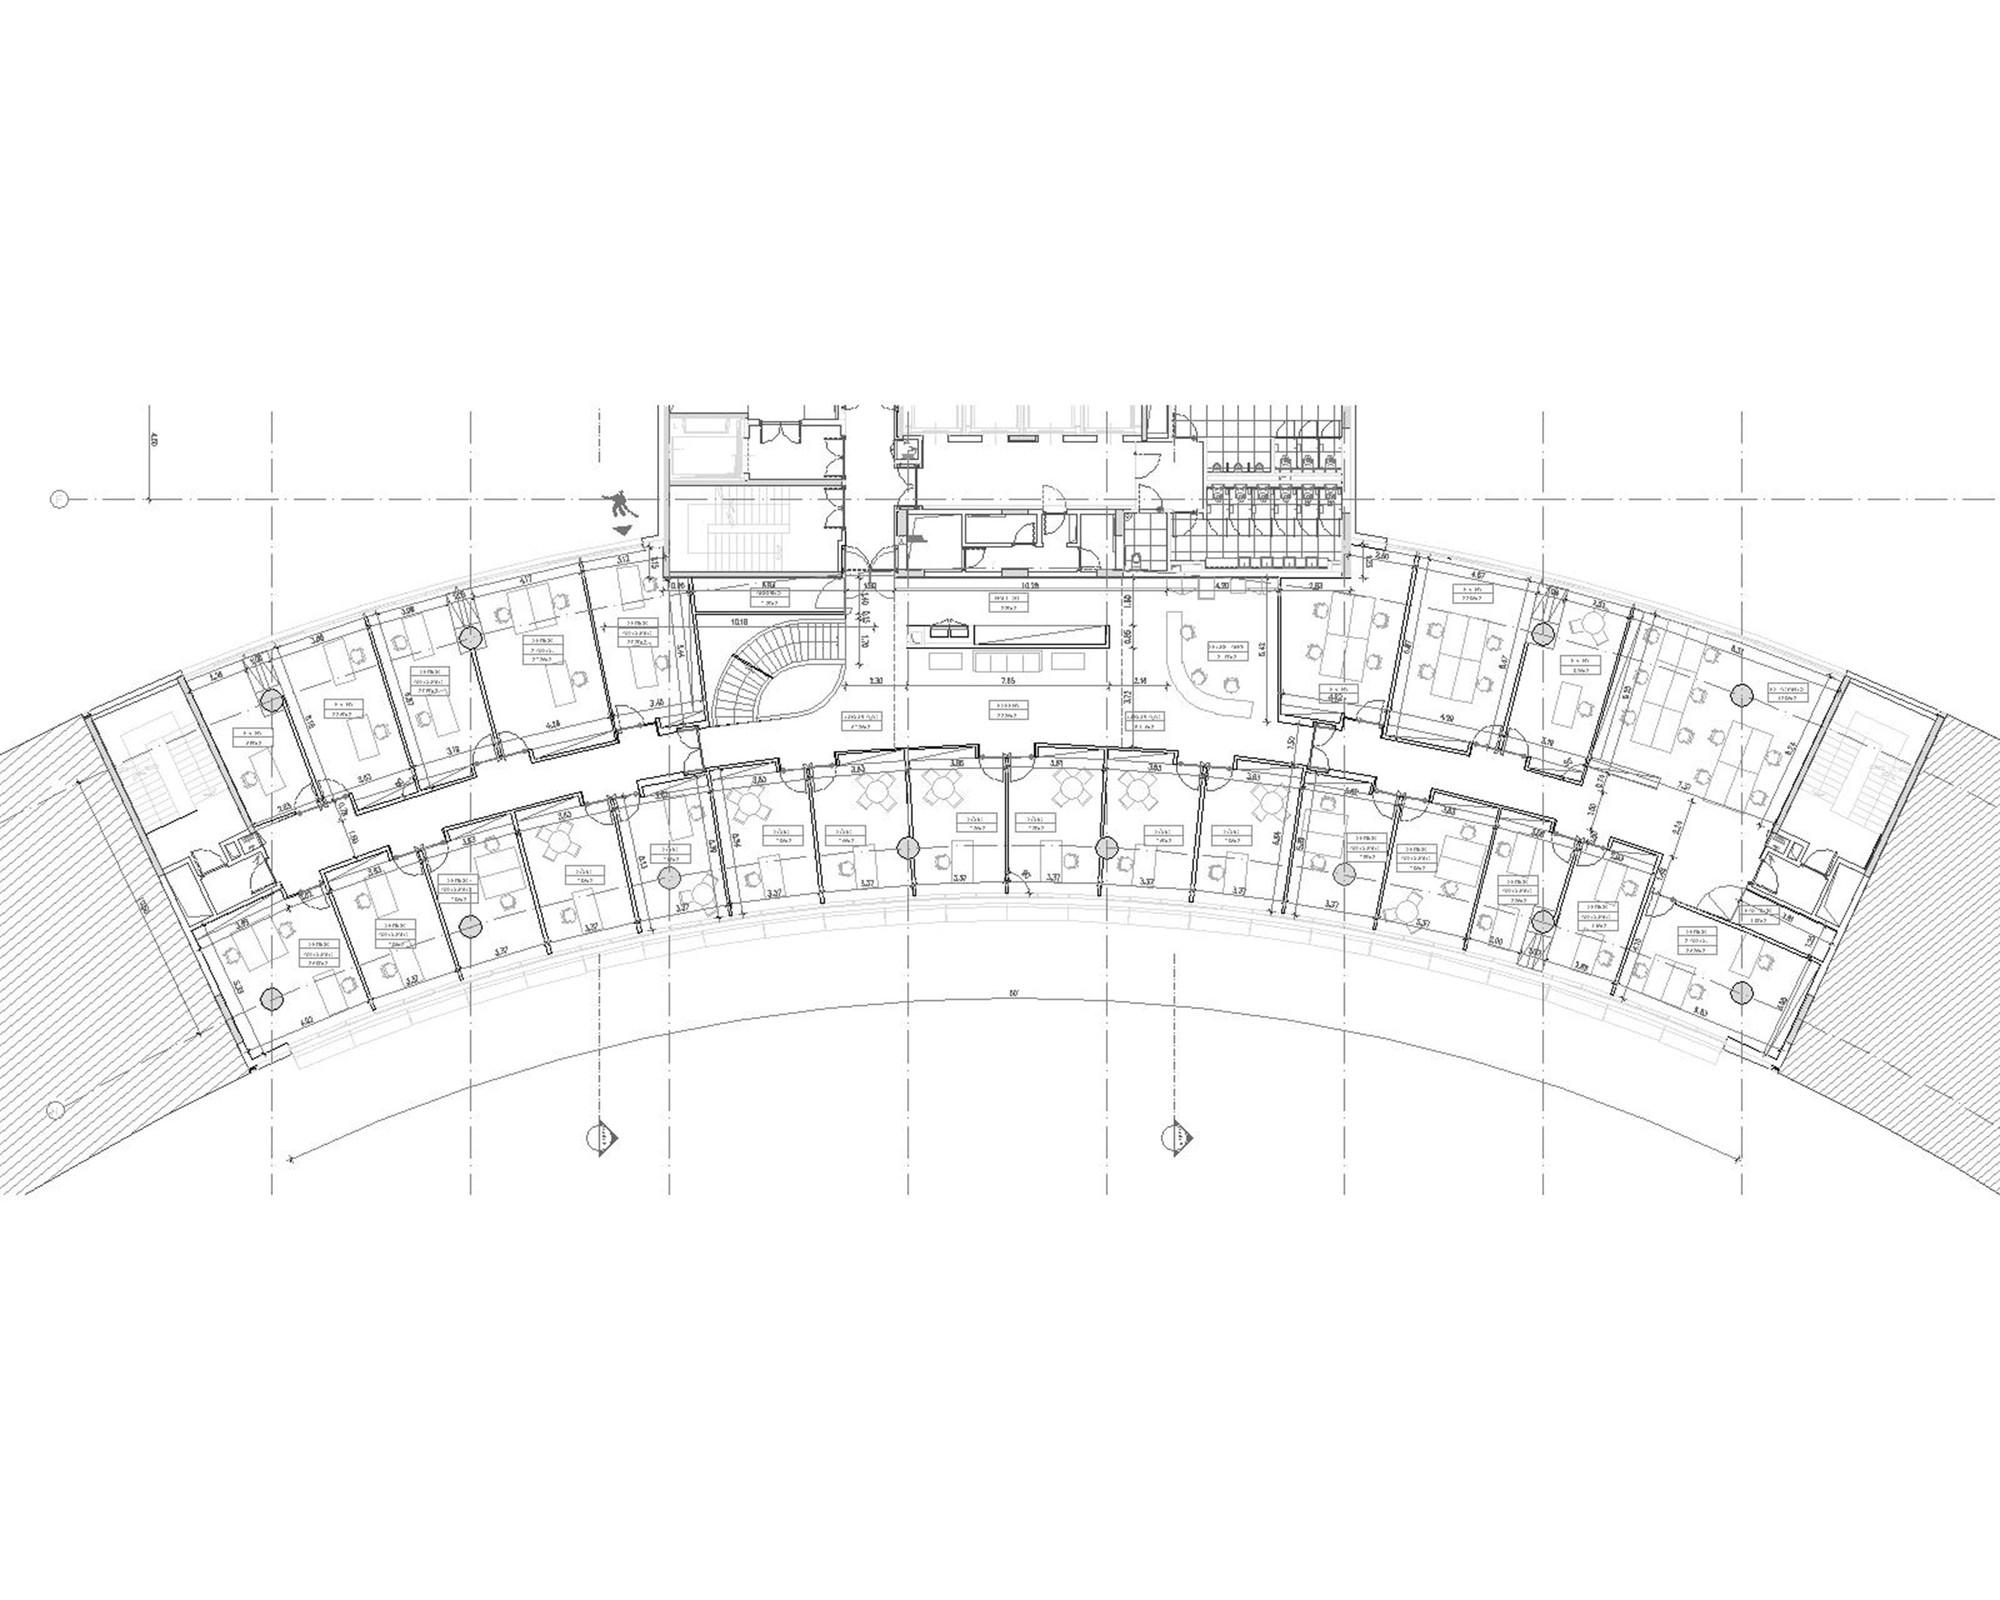 Law Office Floor Plan: Gallery Of Miranda Law Firm / Rita Pinto Ribeiro